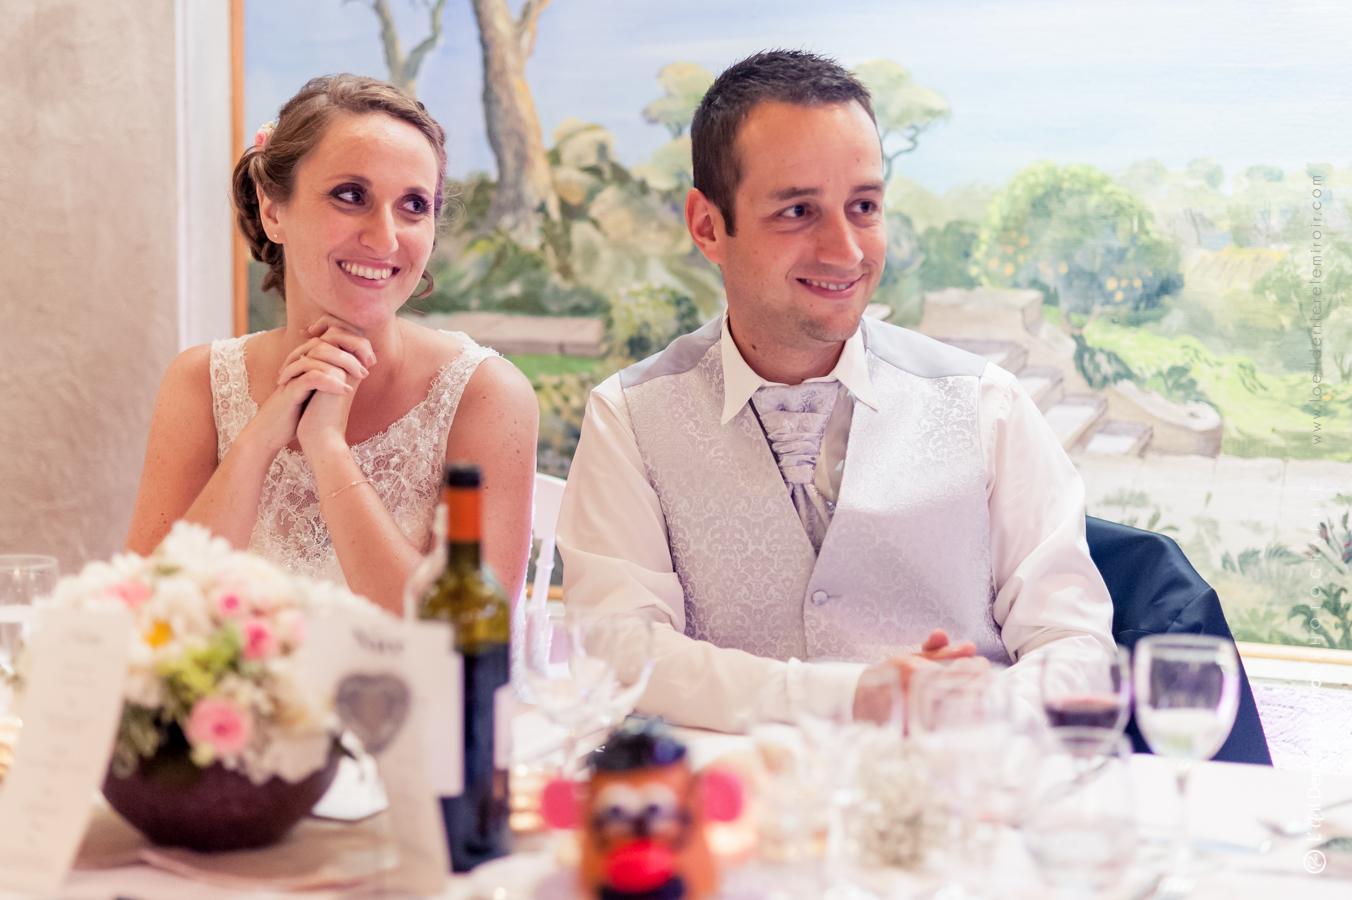 mariage-cj-vaugrenier-loeilderrierelemiroir-075